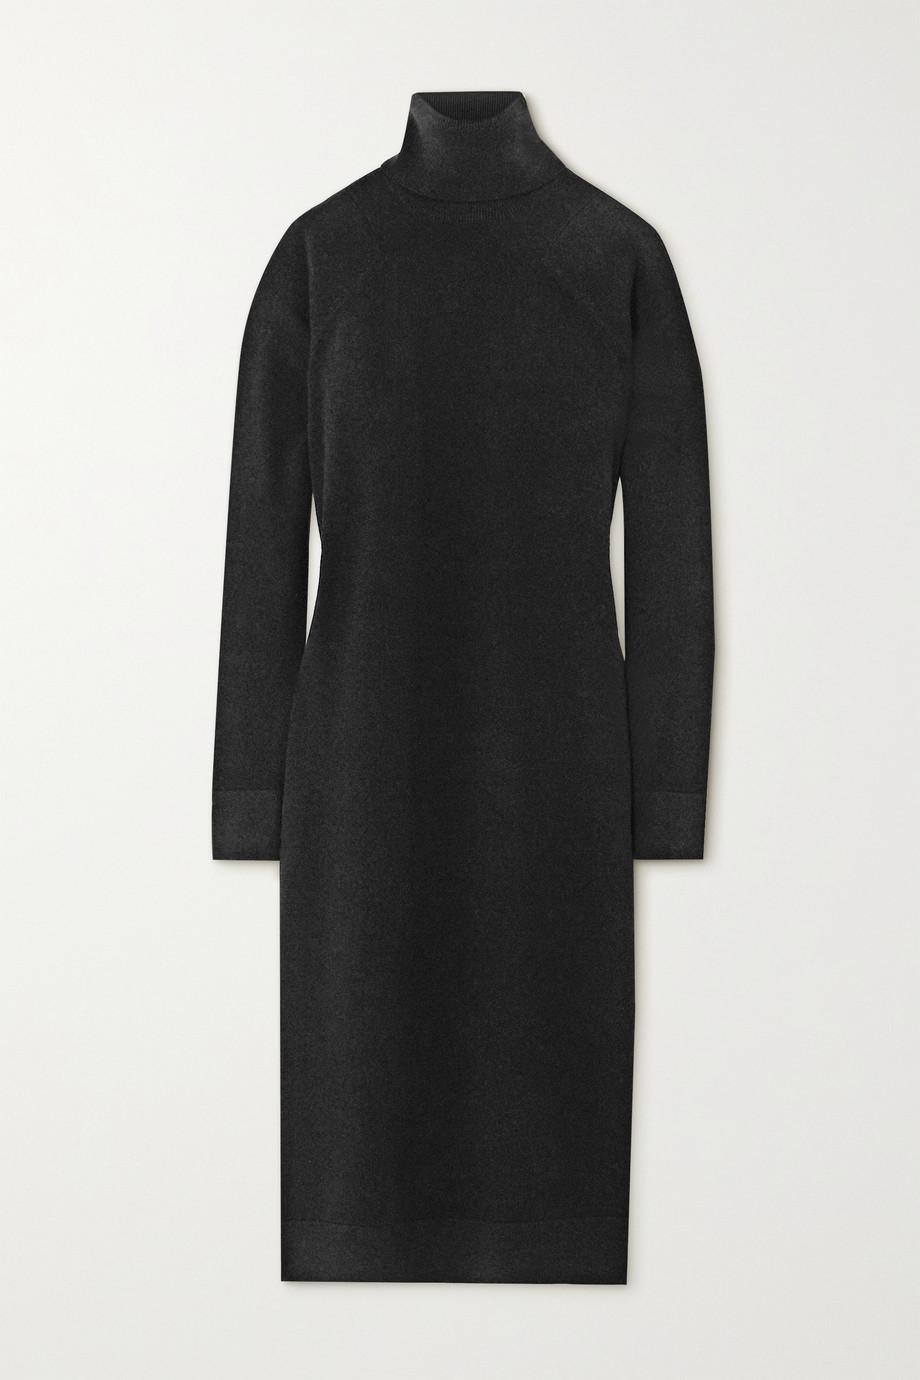 Haider Ackermann Wool and cashmere-blend turtleneck midi dress